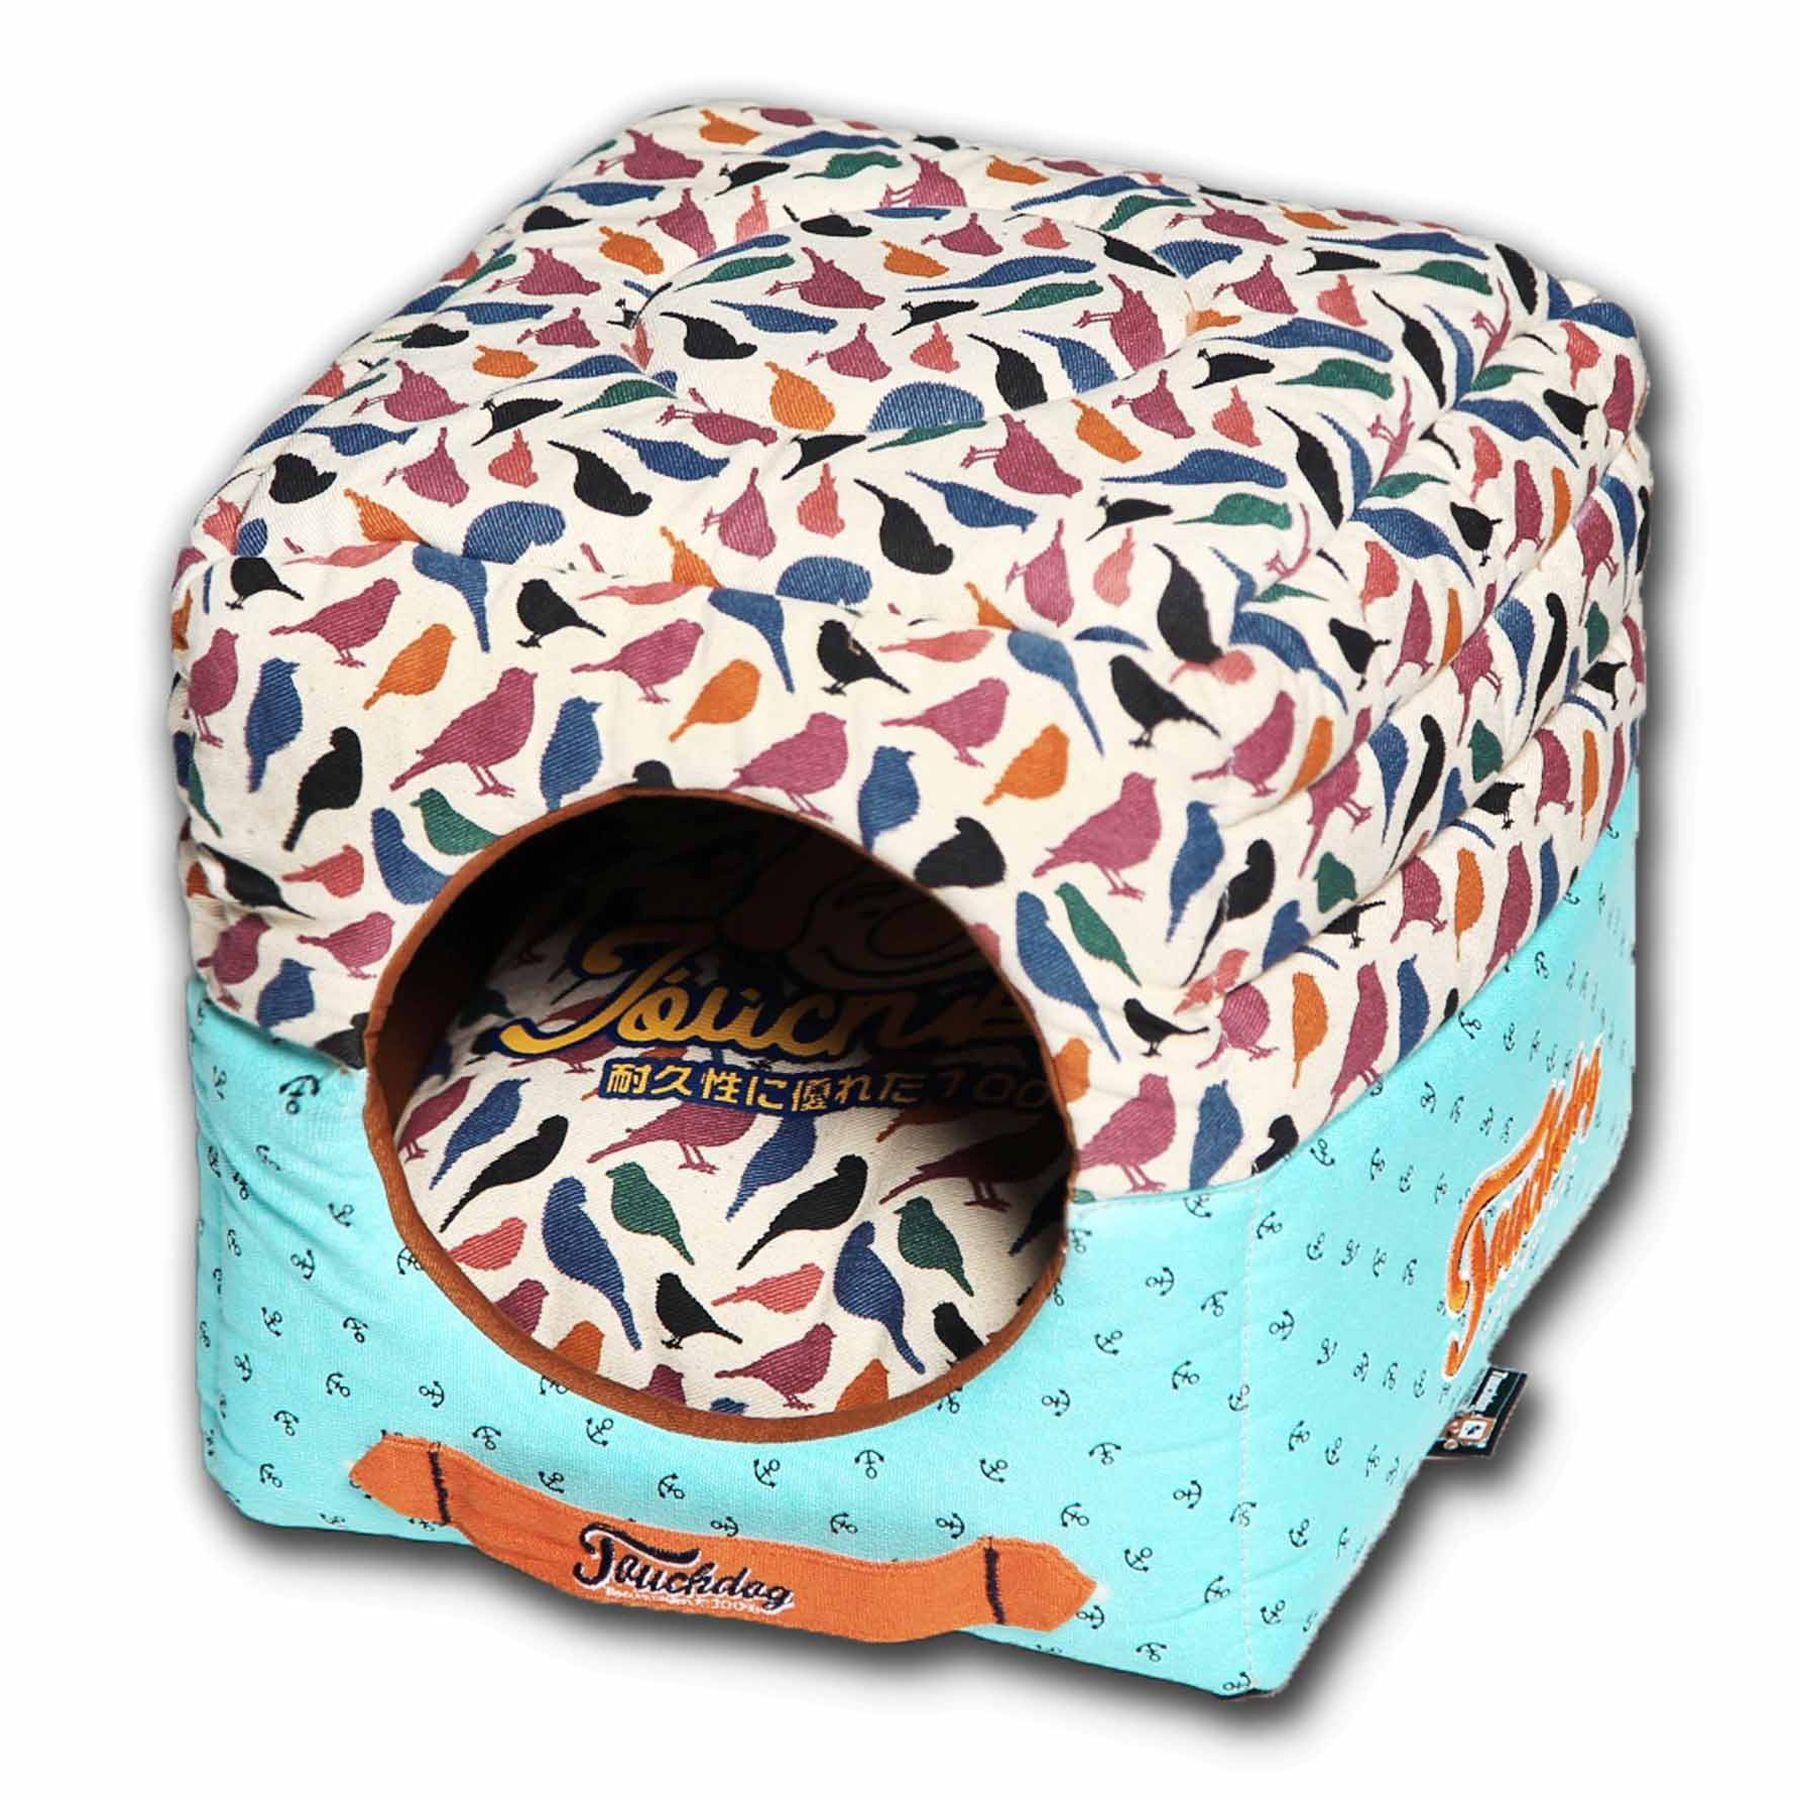 Pet Life Touchdog Bird Convertible Dog Bed, White Dog